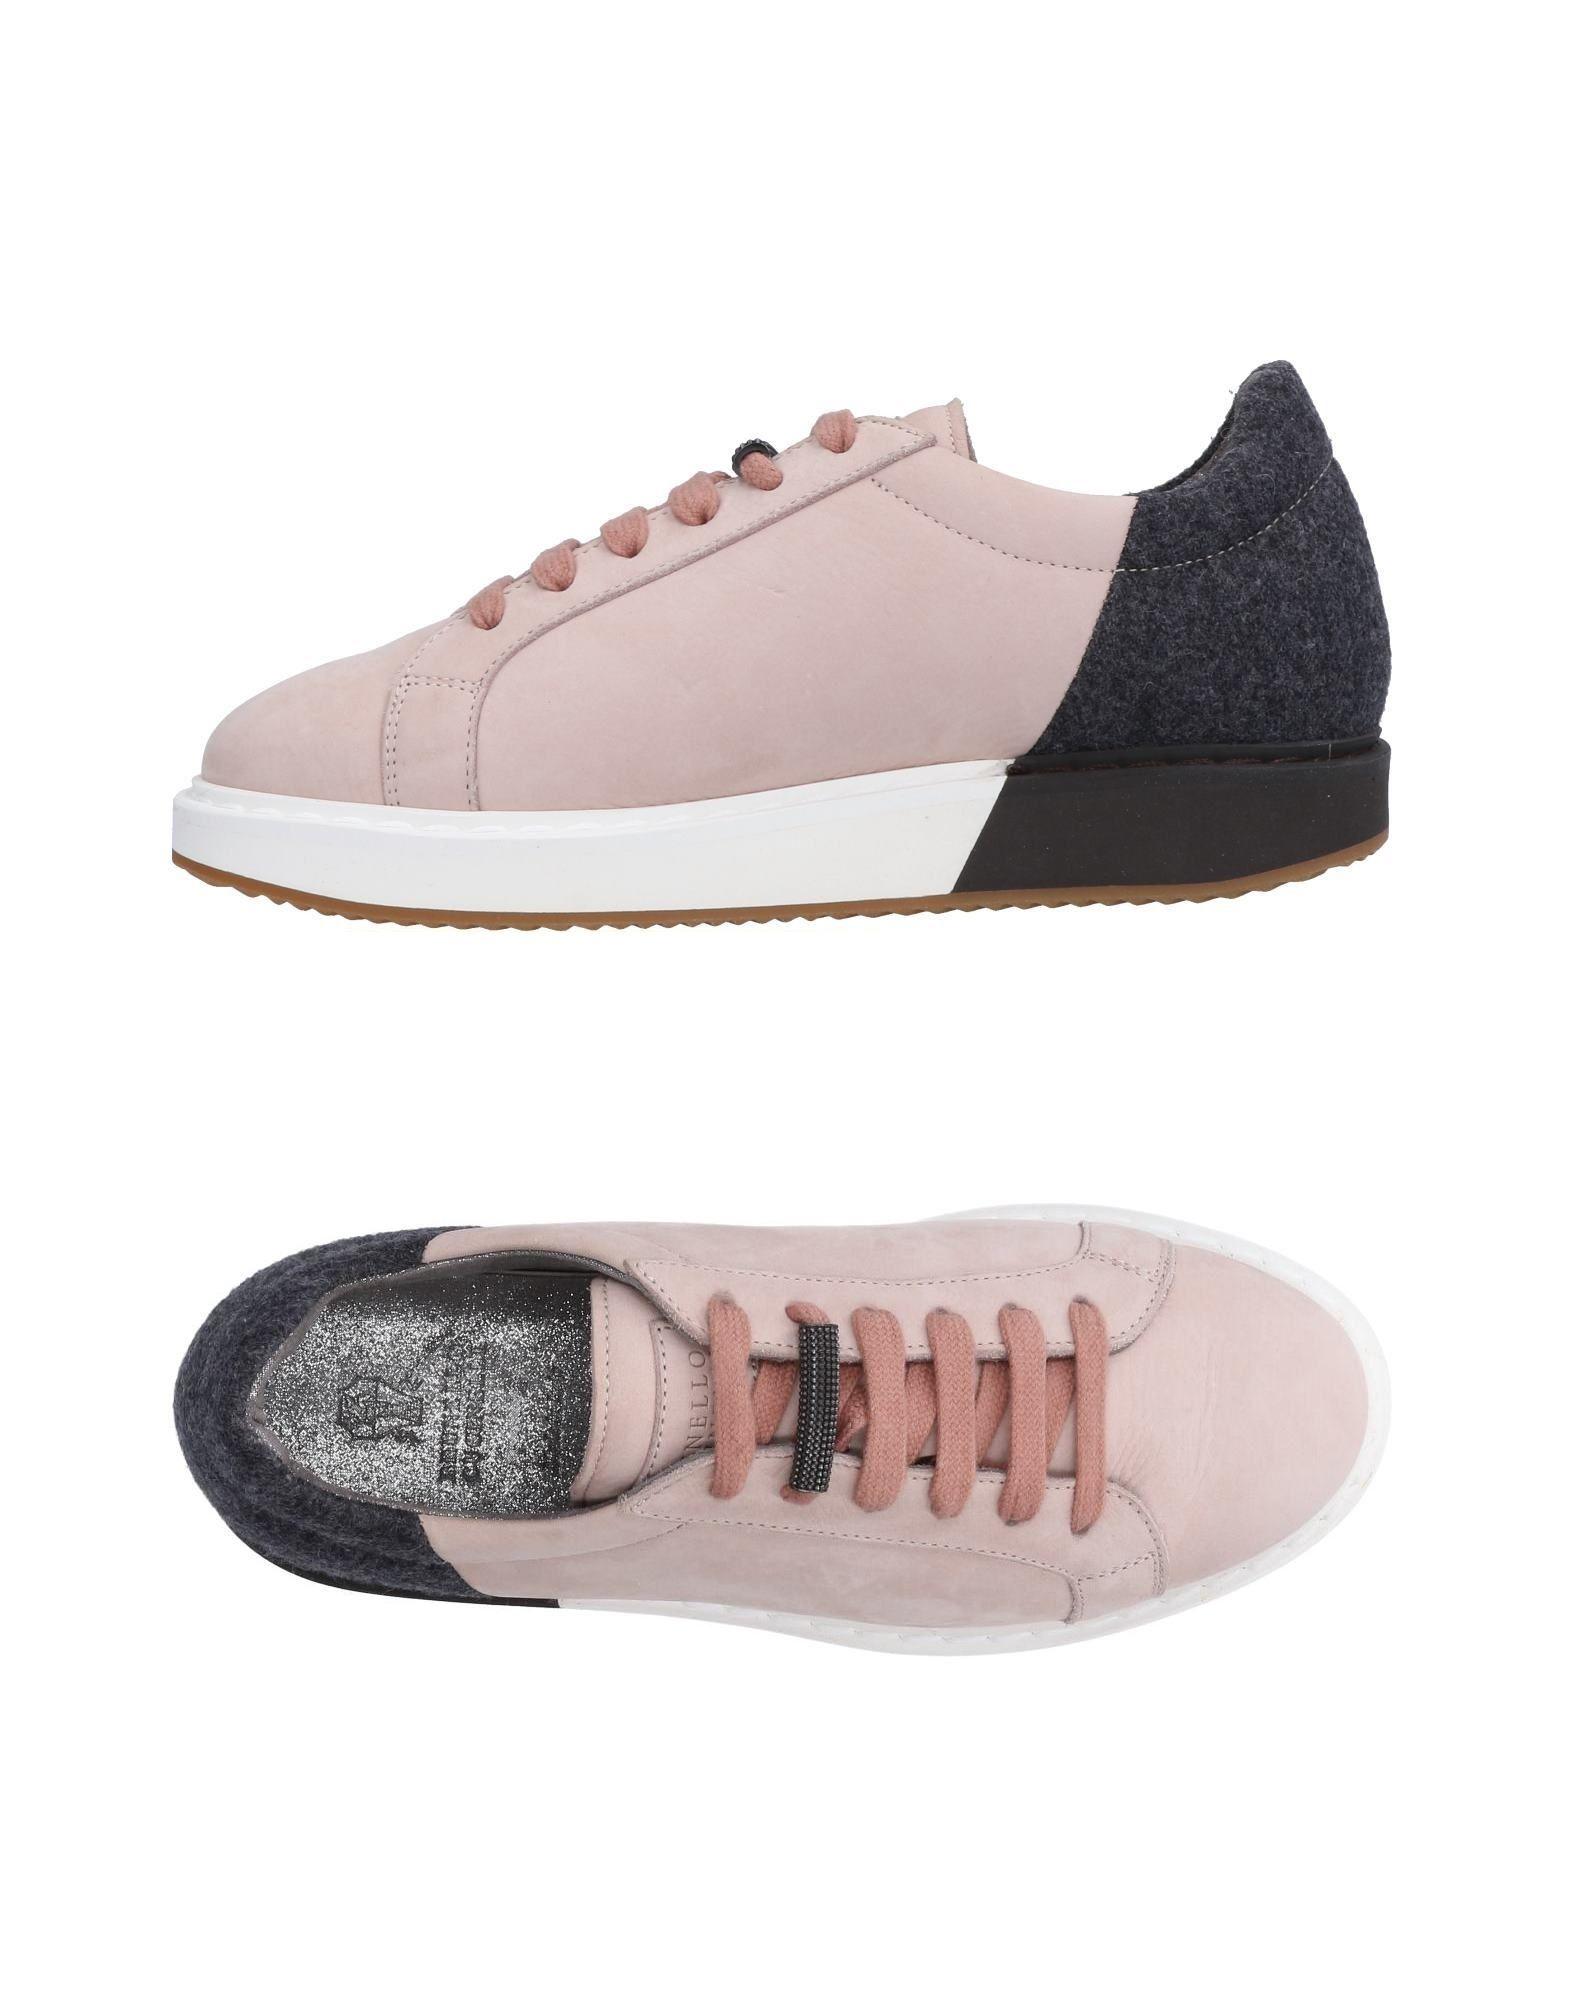 Brunello Cucinelli Sneakers Damen Beliebte  11504929VF Beliebte Damen Schuhe 065054